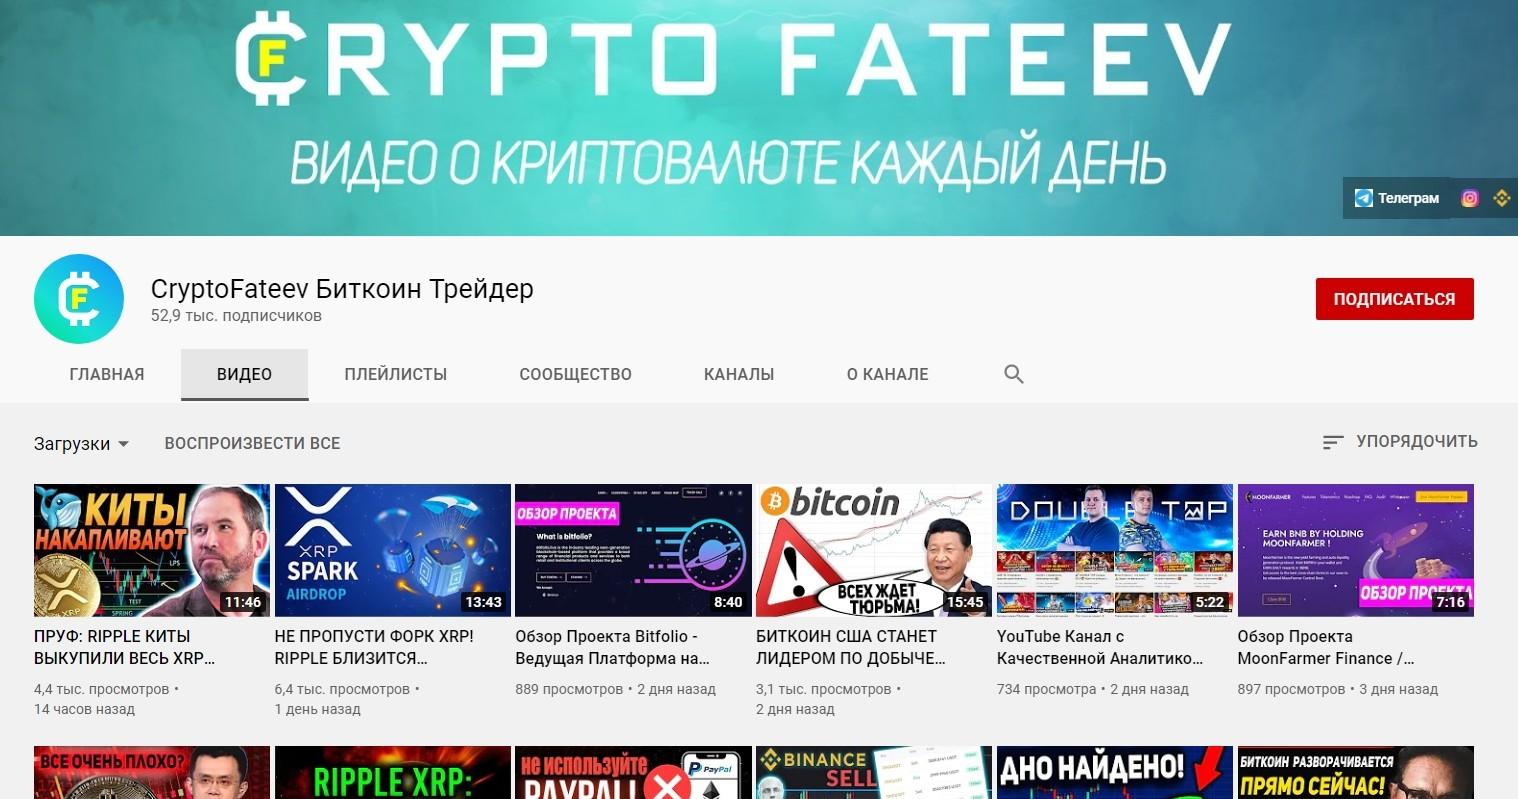 Ютуб канал Cryptofateev